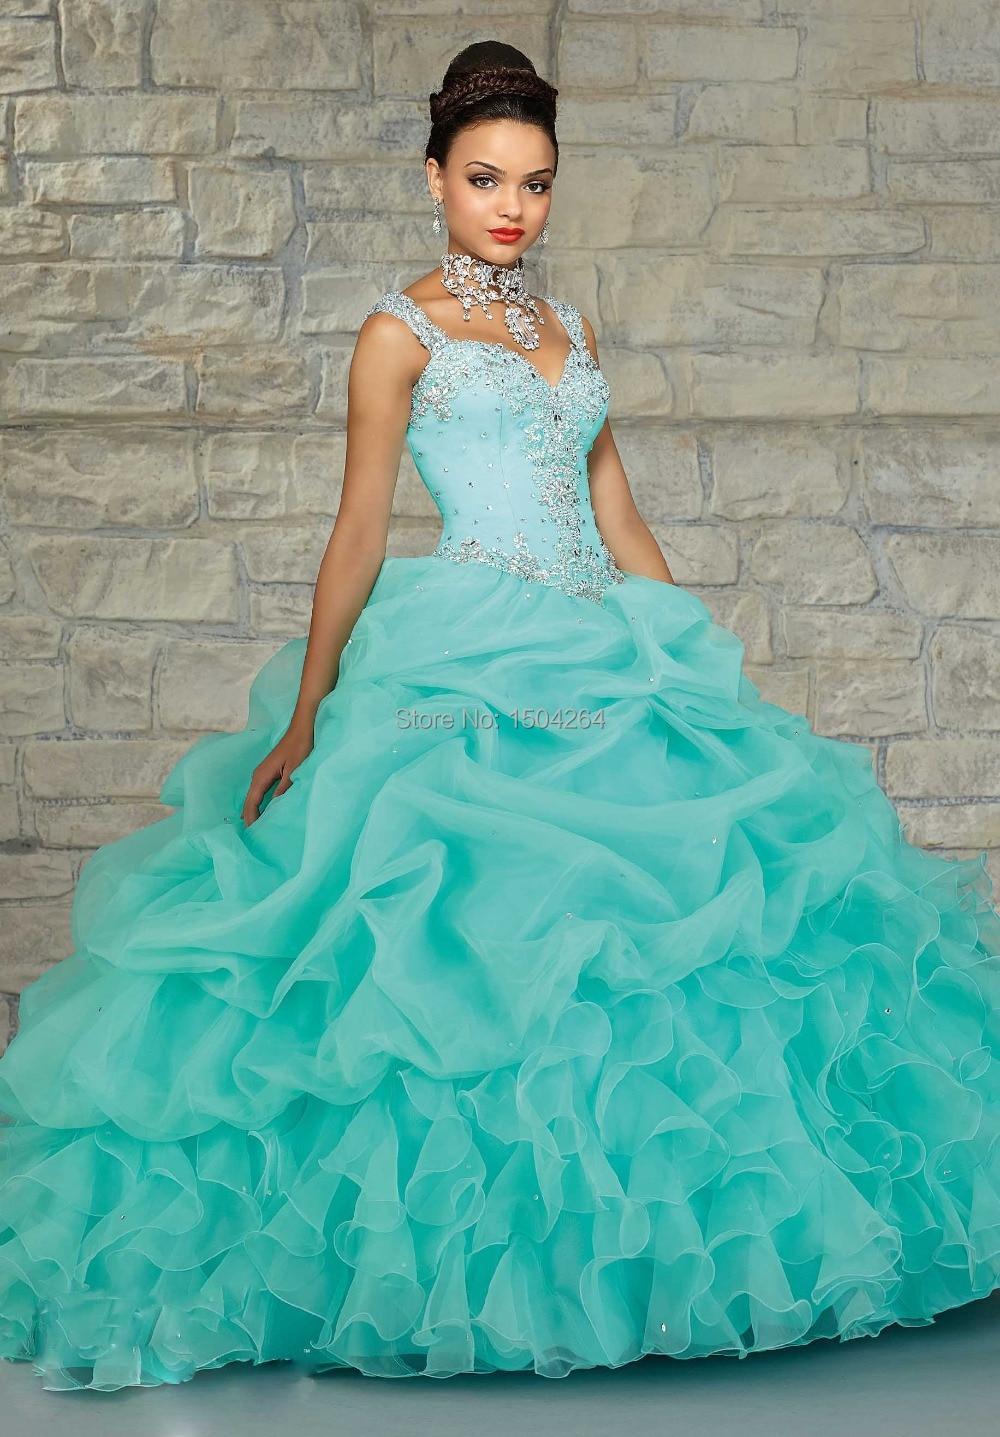 Cheap quinceanera gowns aqua quinceanera dresses 2015 pink sweet 16 ...